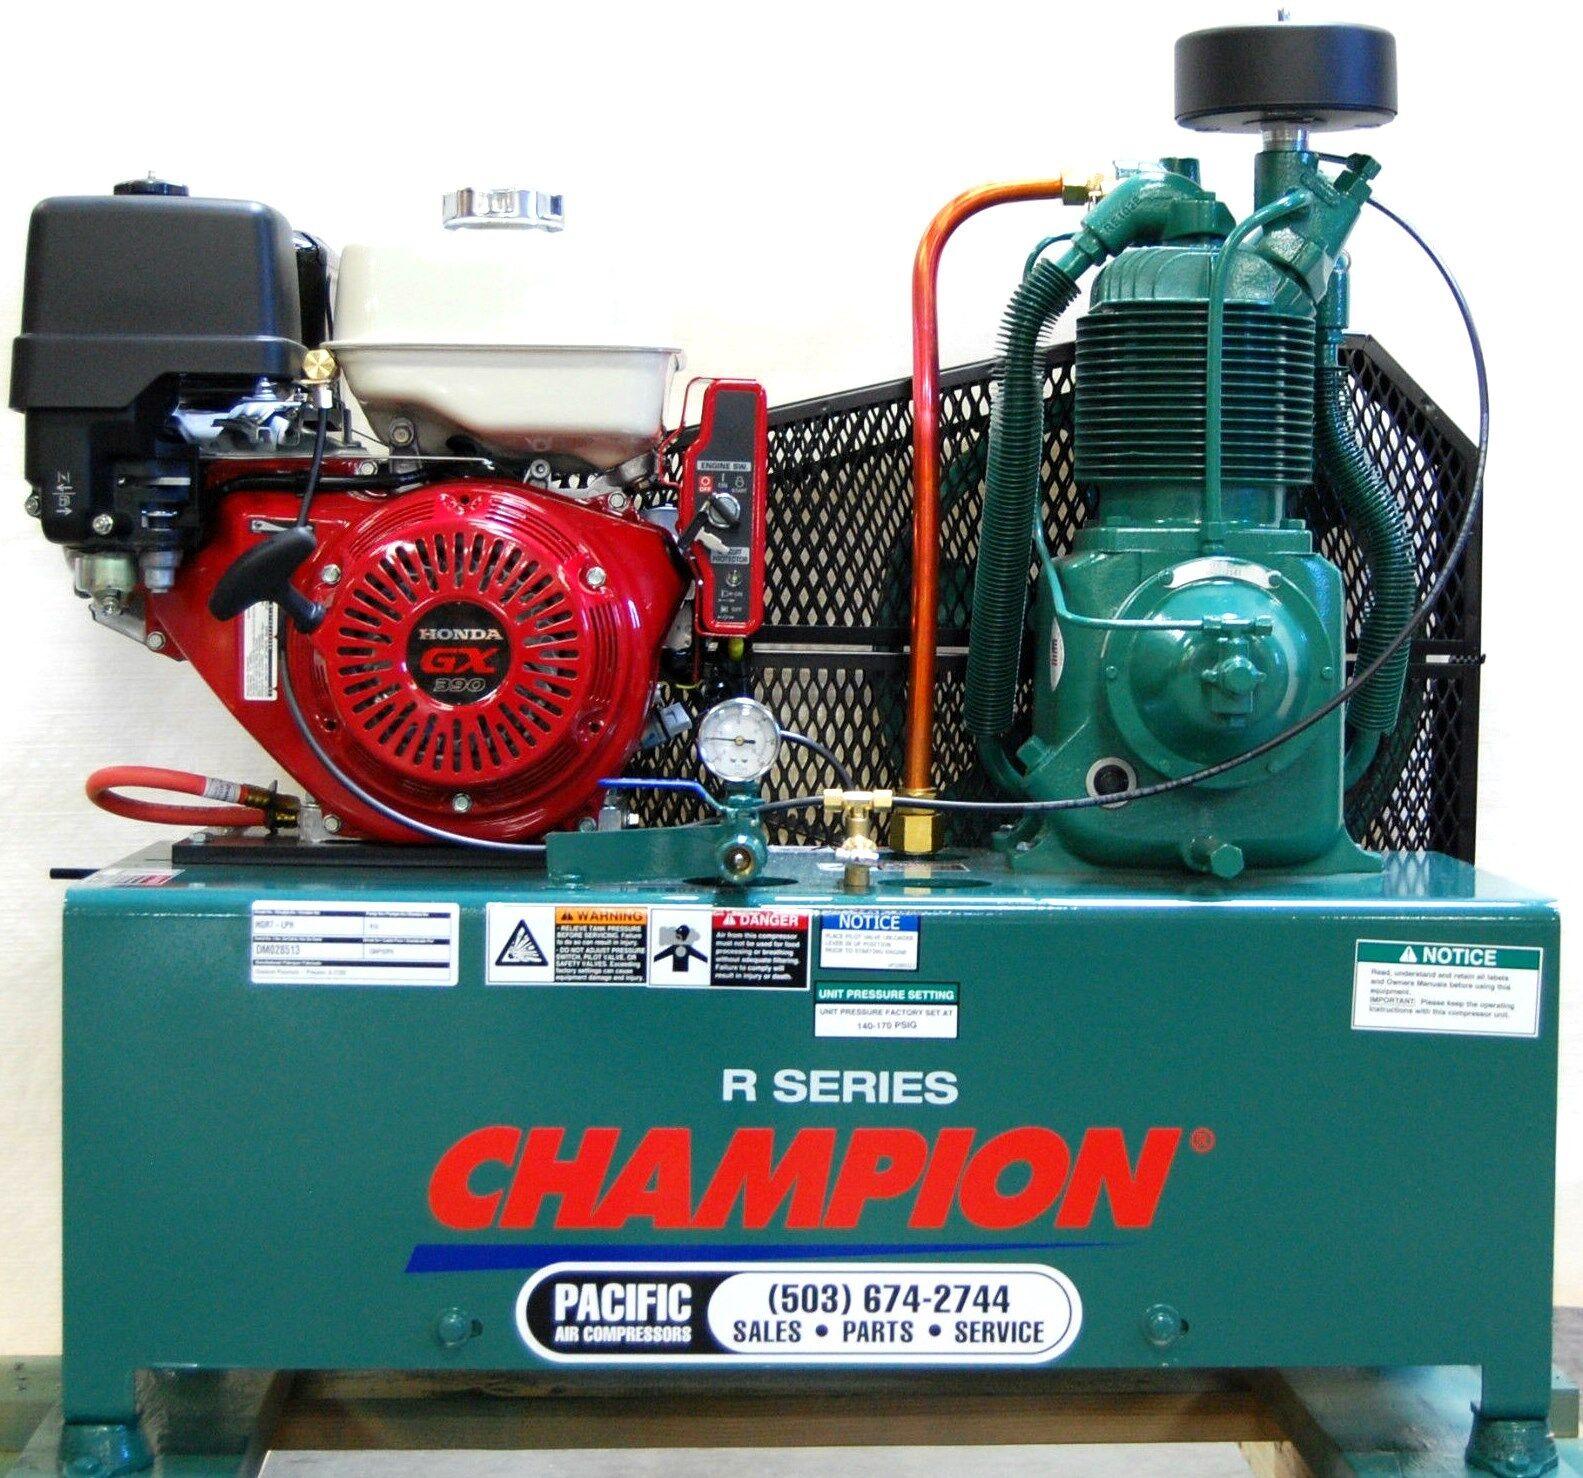 Champion Hgr7 Lph 4 Gal Twin Tanks 13hp Honda Gas Compressor Gx390 Sidecar Wiring Diagram Elec Start